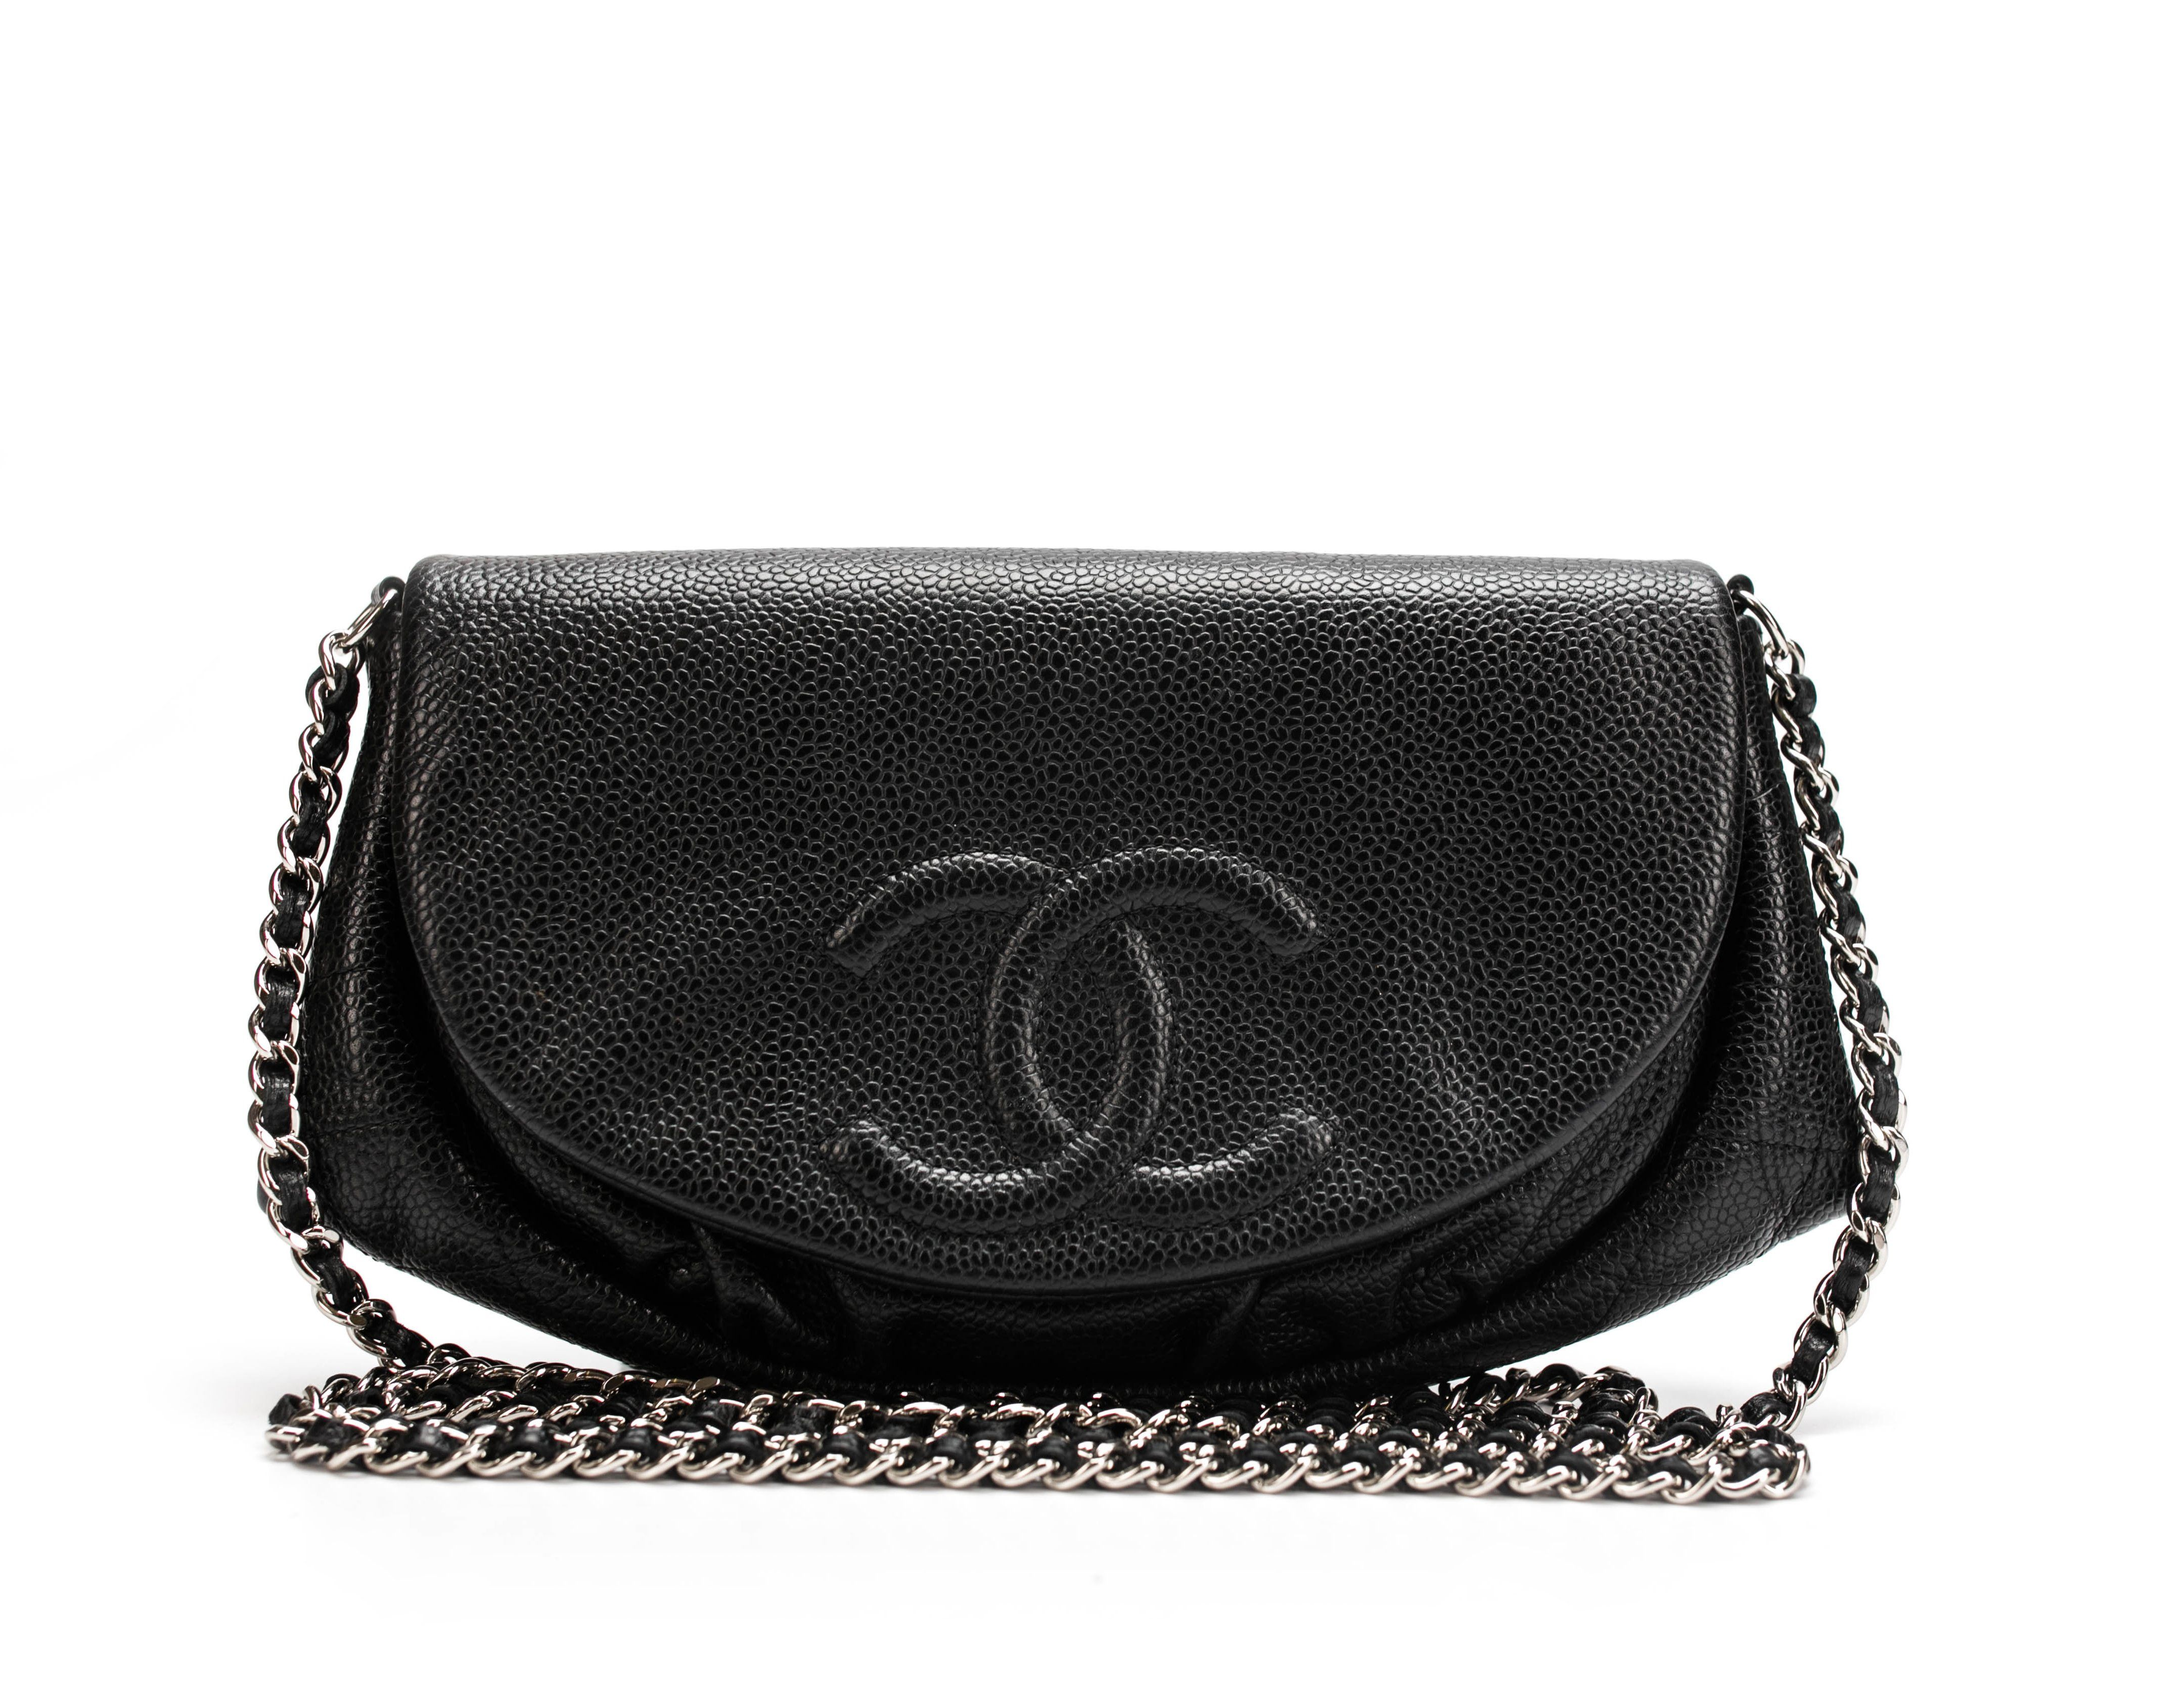 Chanel black caviar half moon woc wallet on chain bag